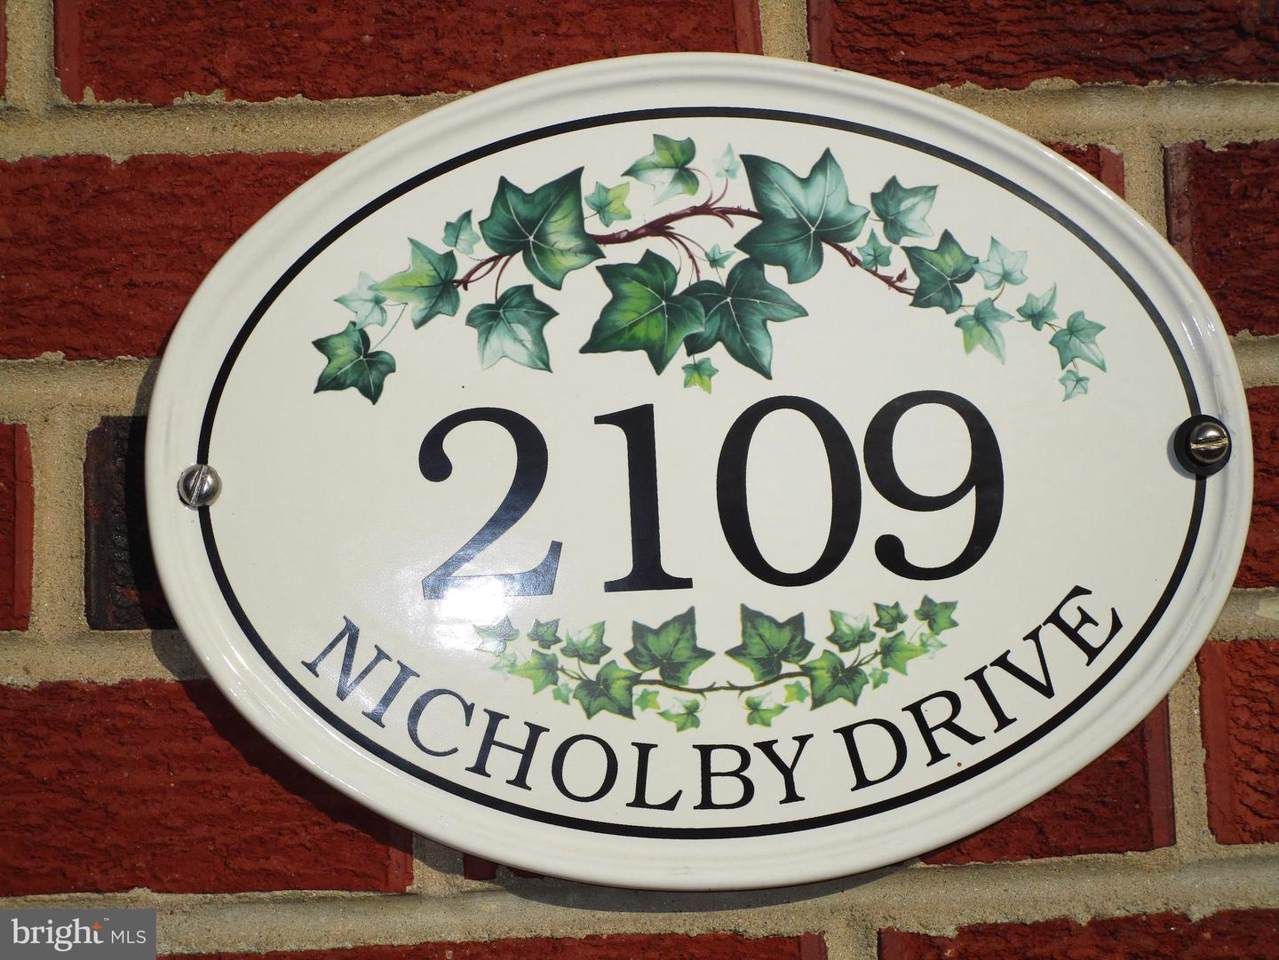 2109 Nicholby Drive - Photo 1